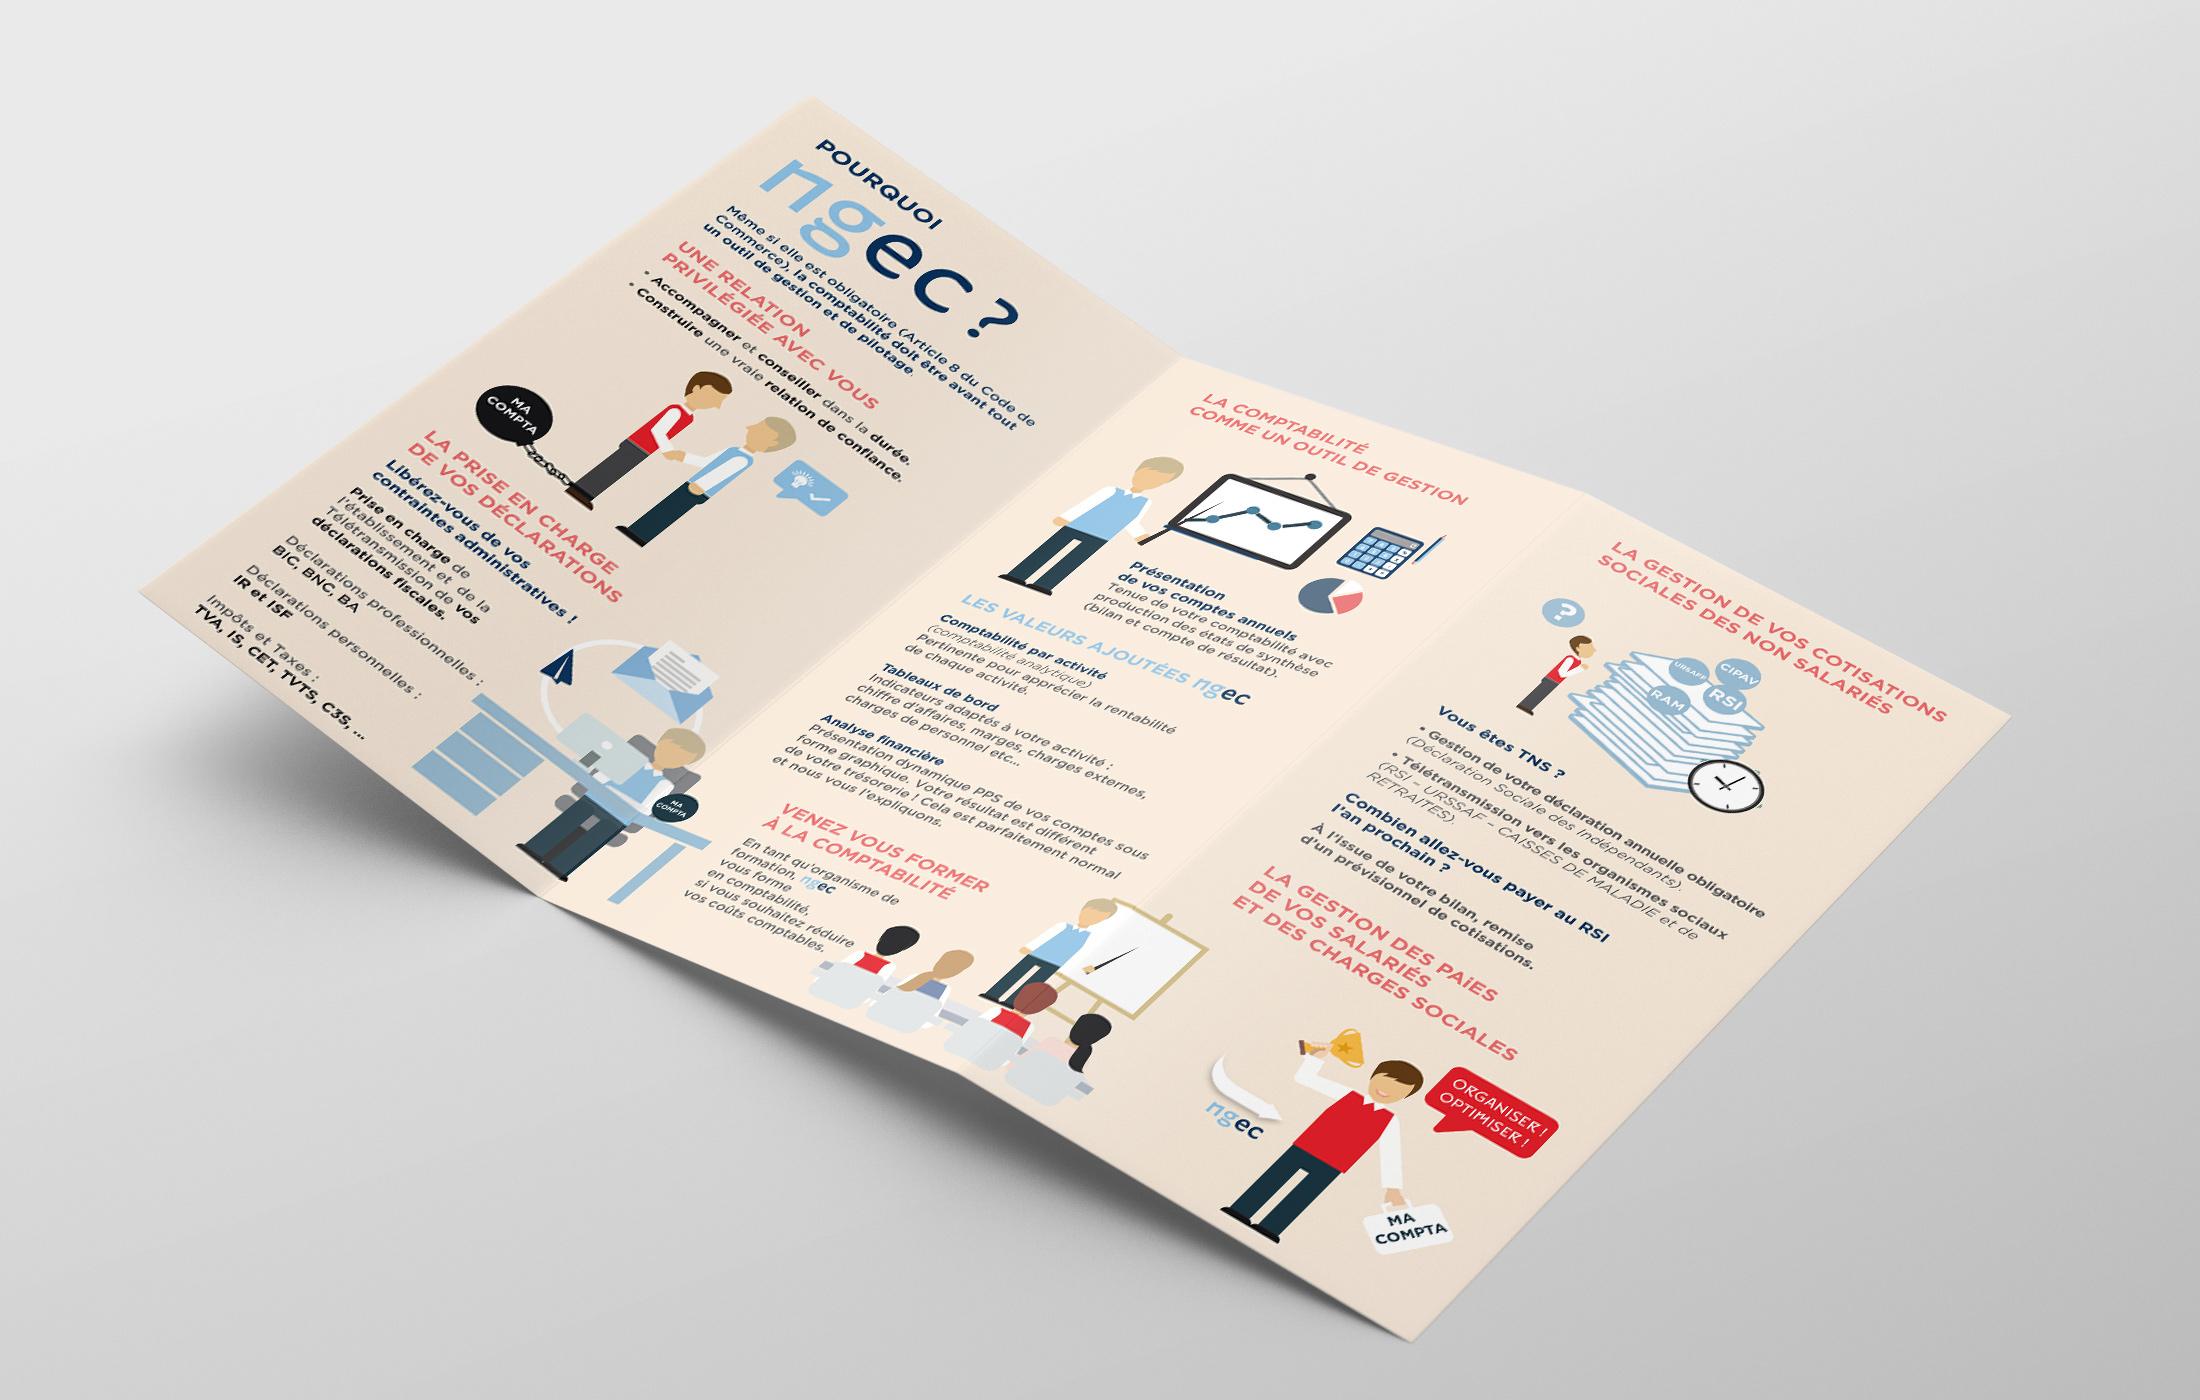 NGEC-brochure-studio-abracadabra